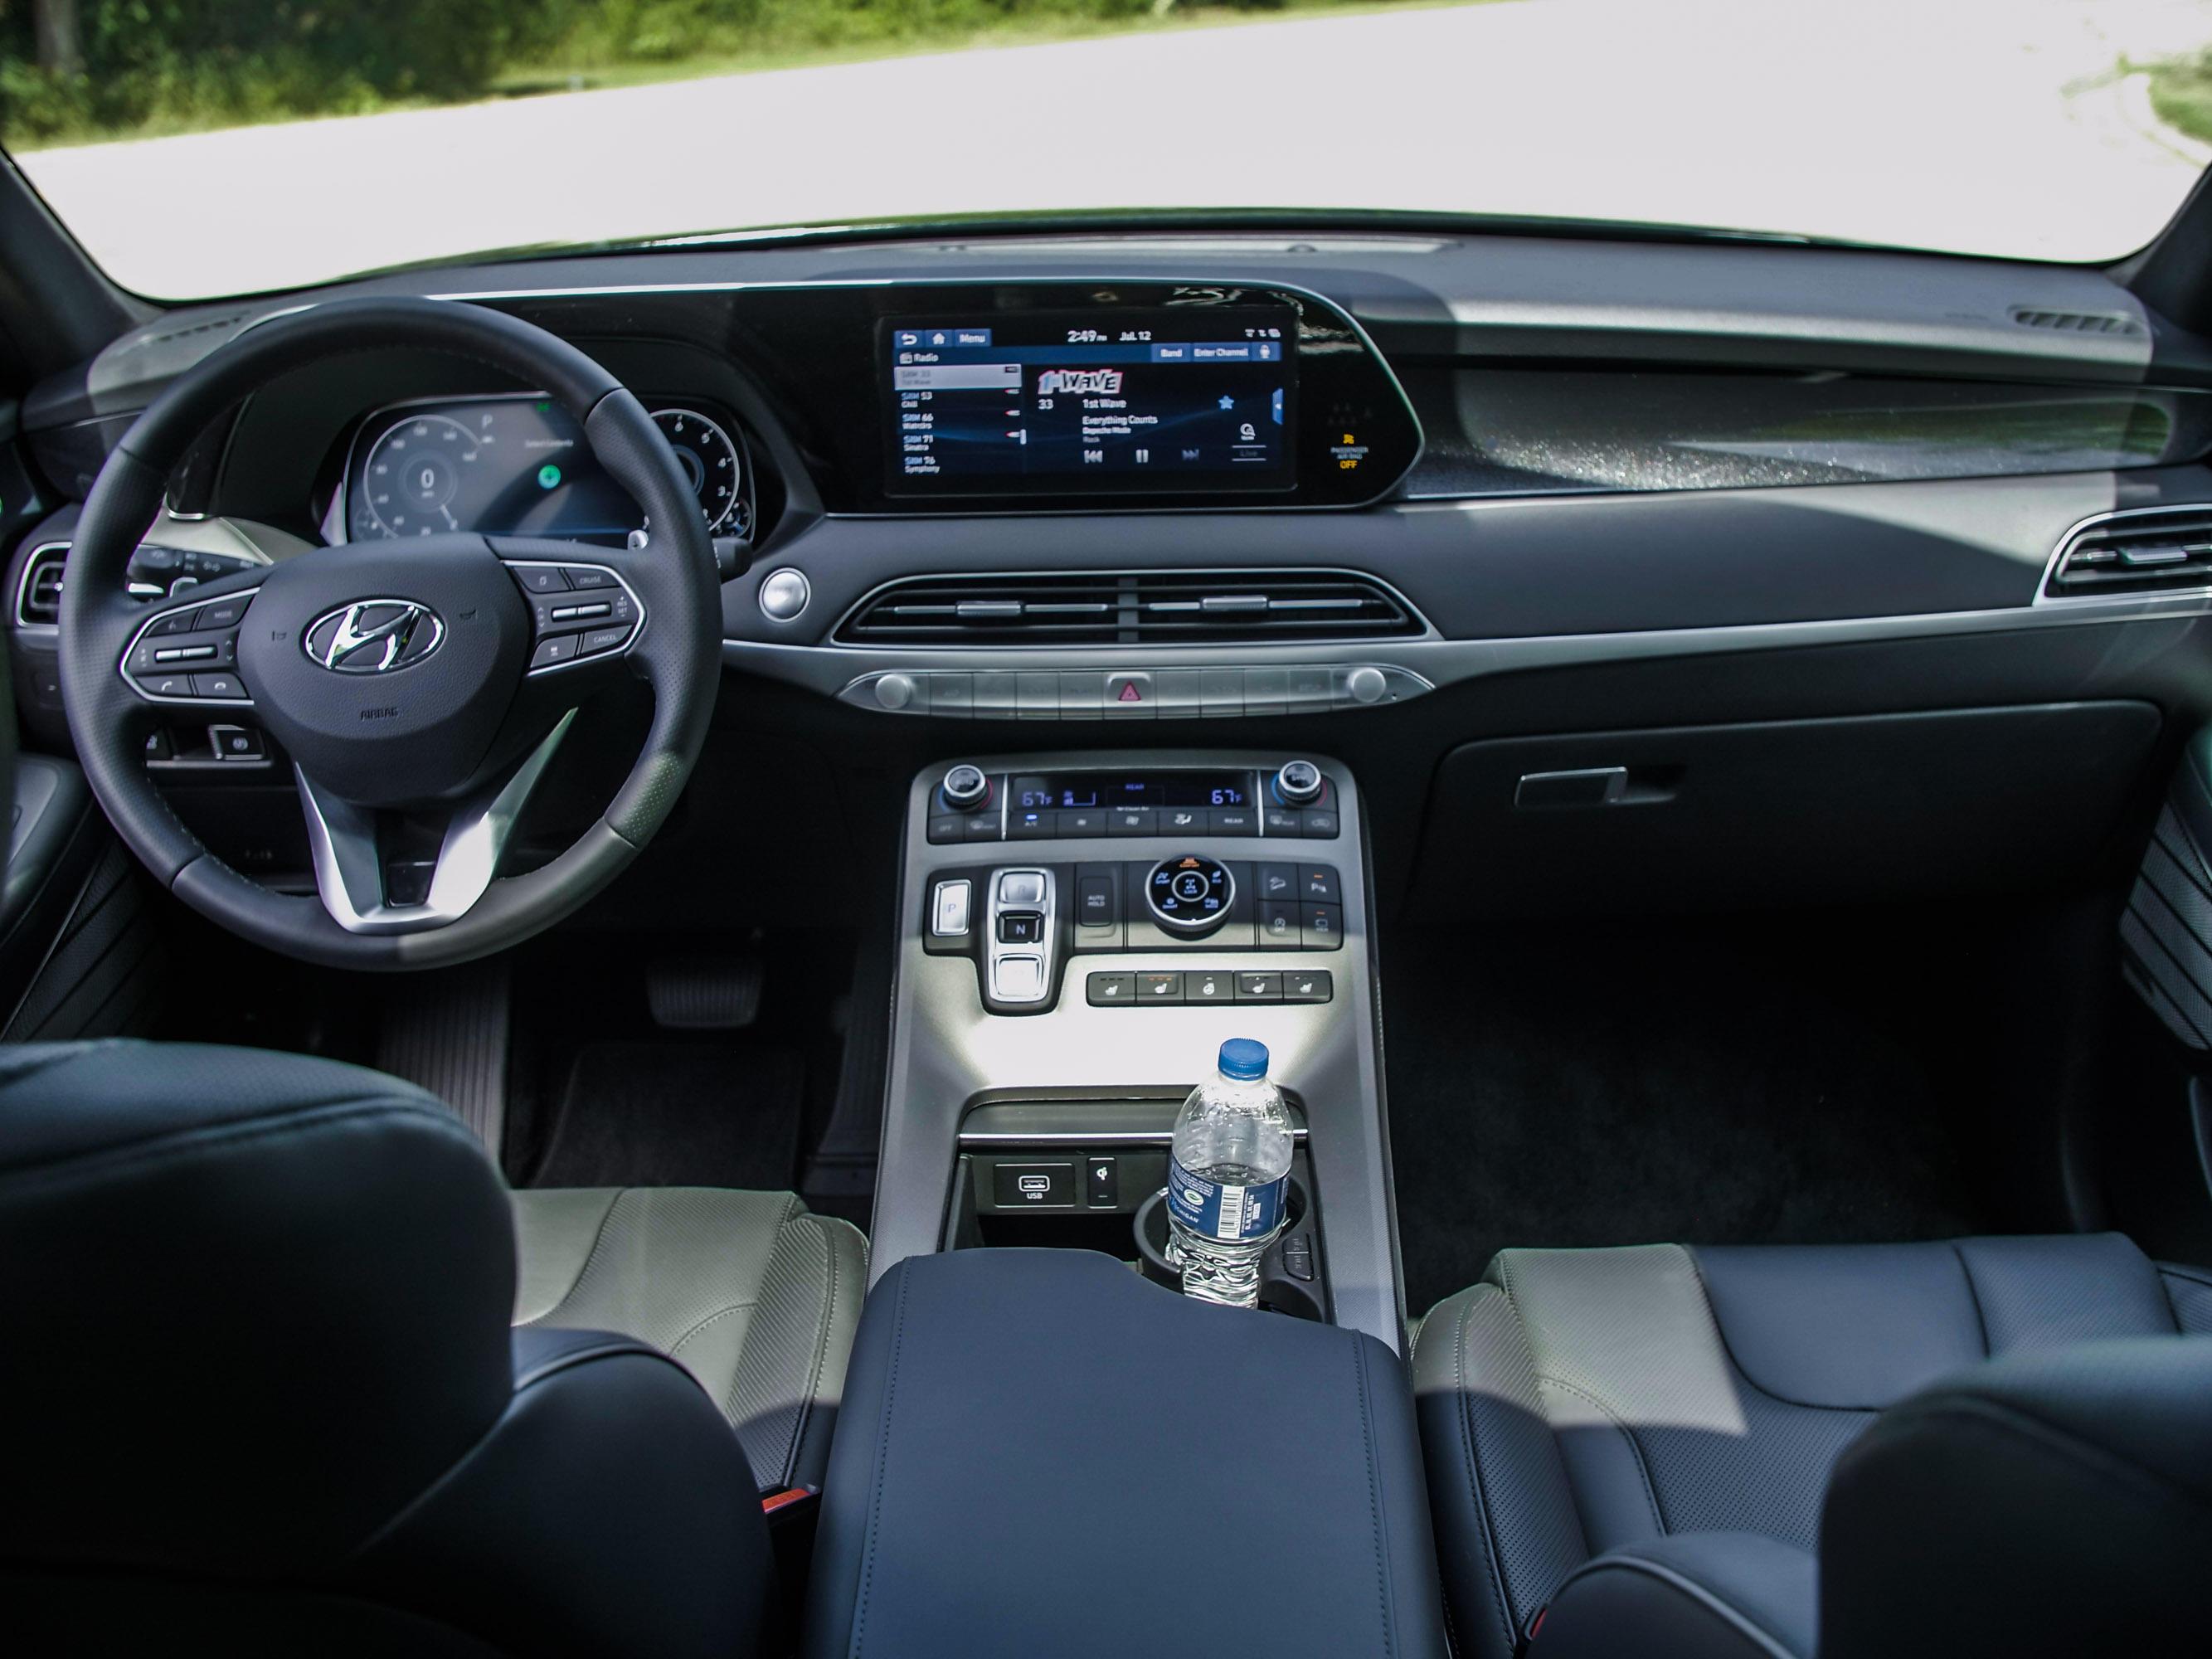 2020 Hyundai Palisade dashboard